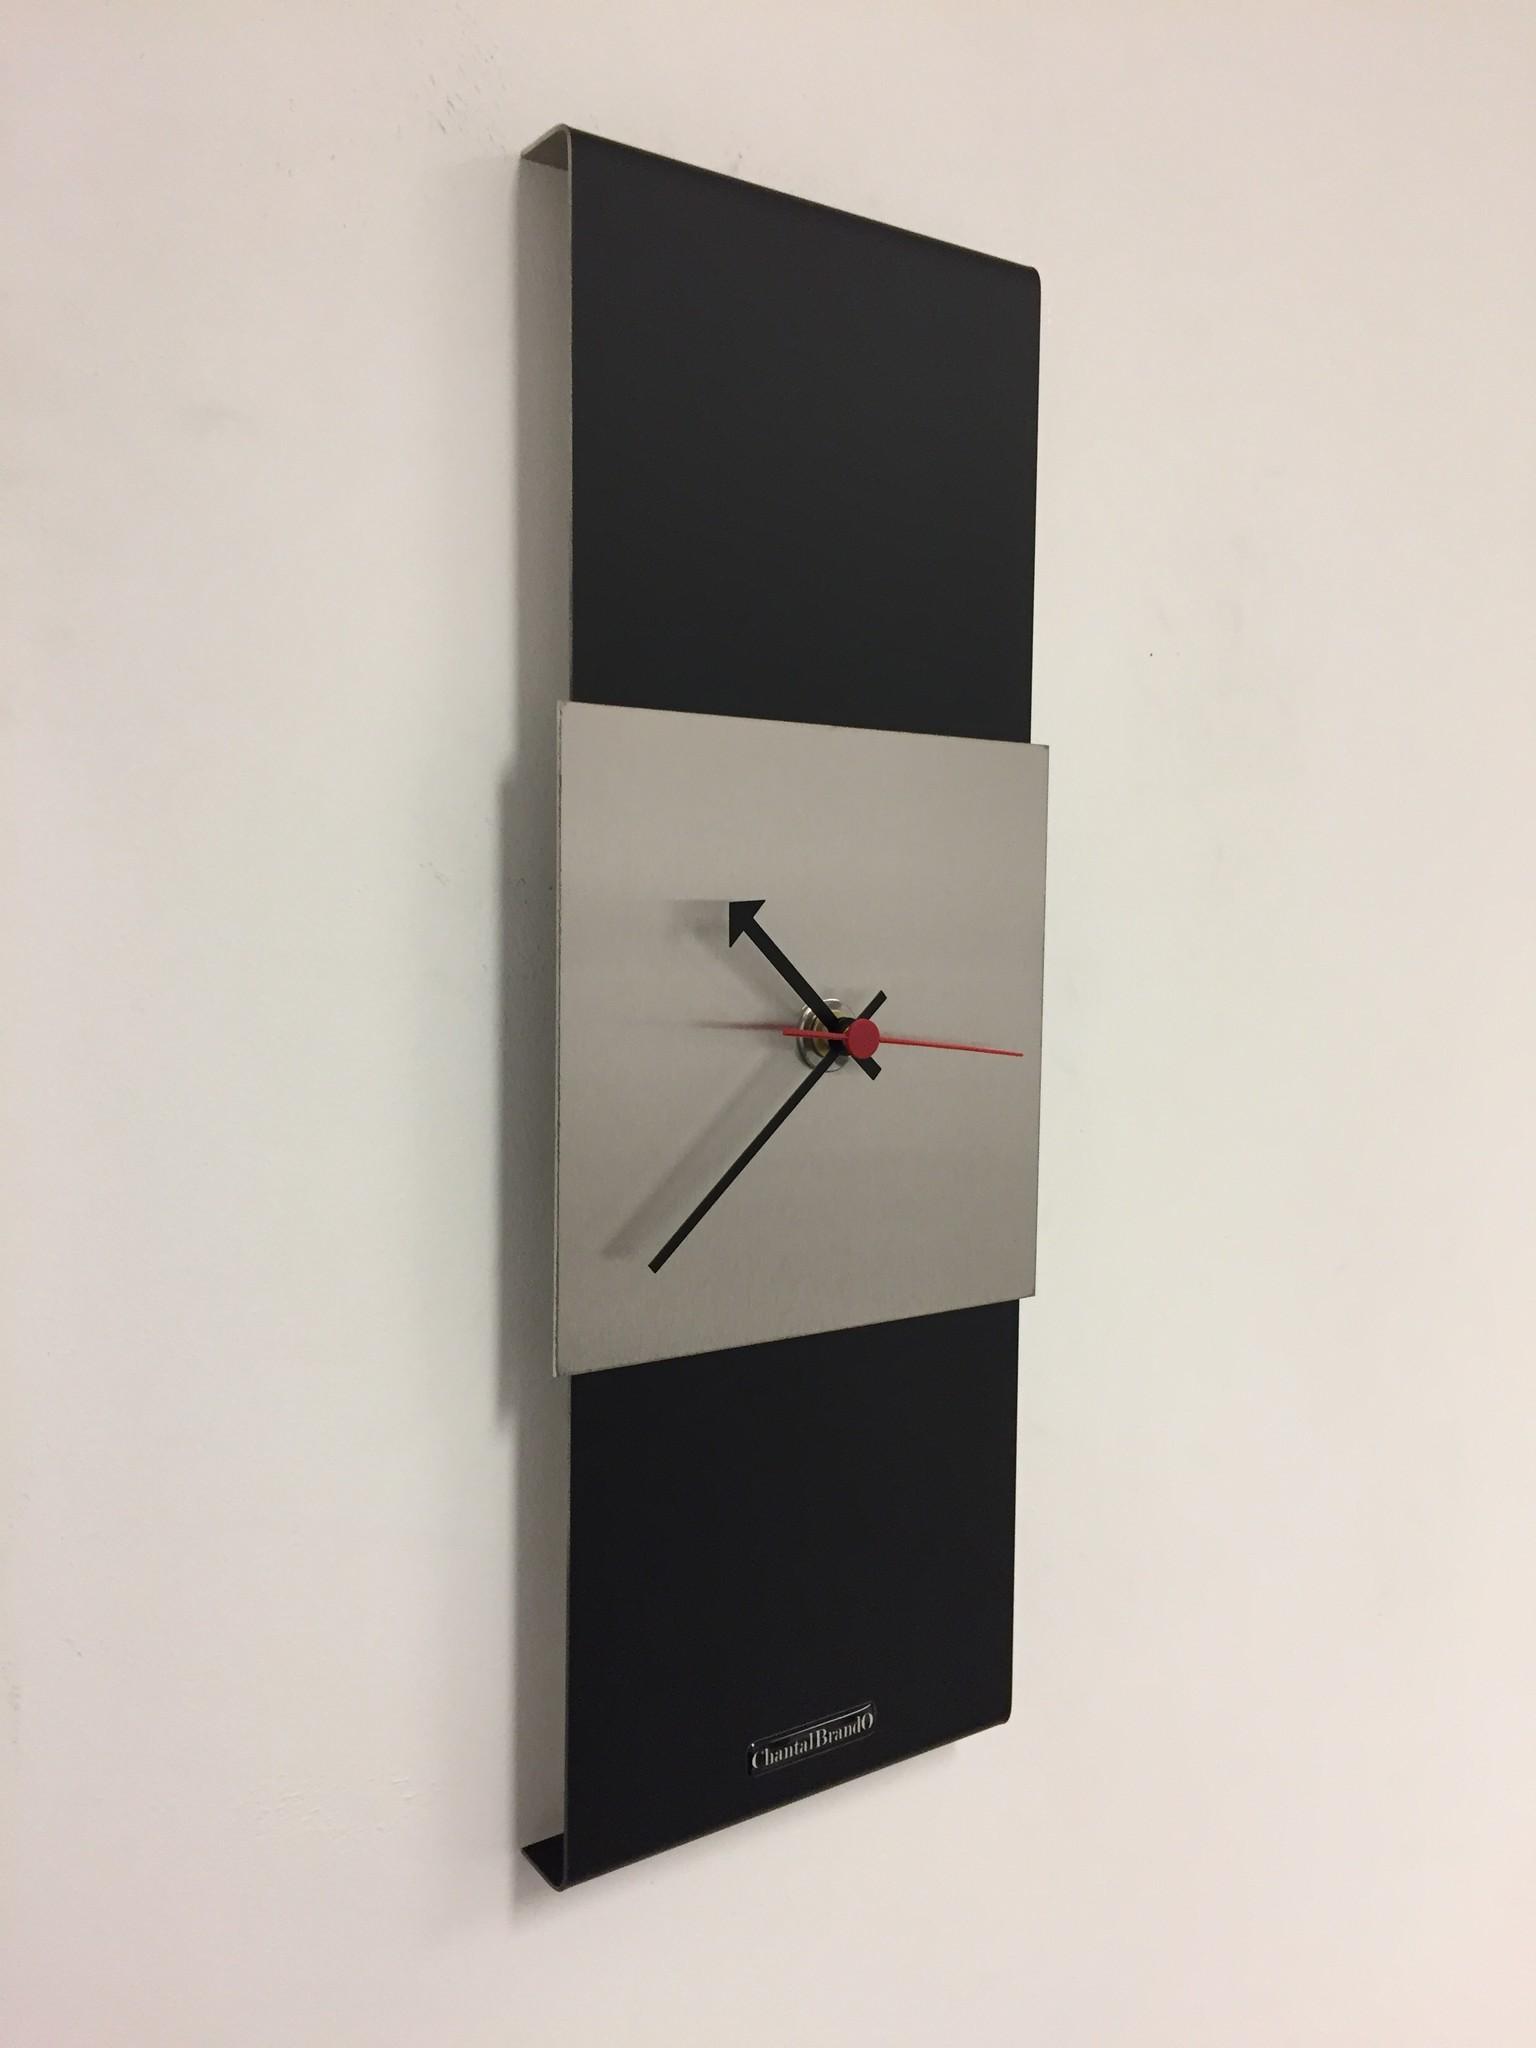 ChantalBrandO Wandklok Black-Line Silver Square RED Pointer Modern Design RVS